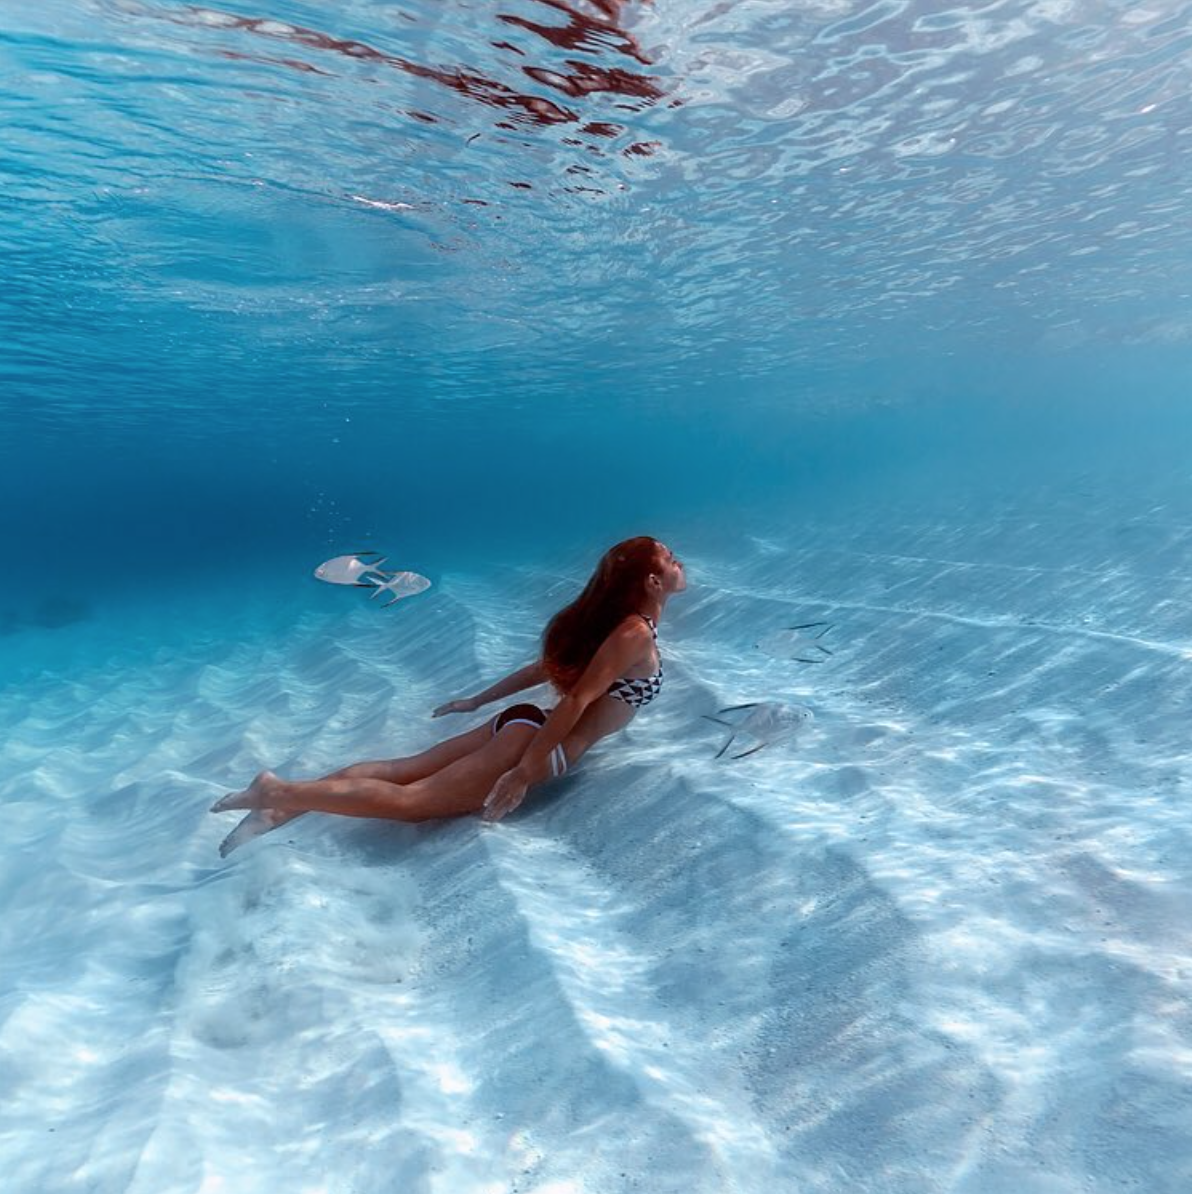 ElenaKalis, les photos sous l'eau